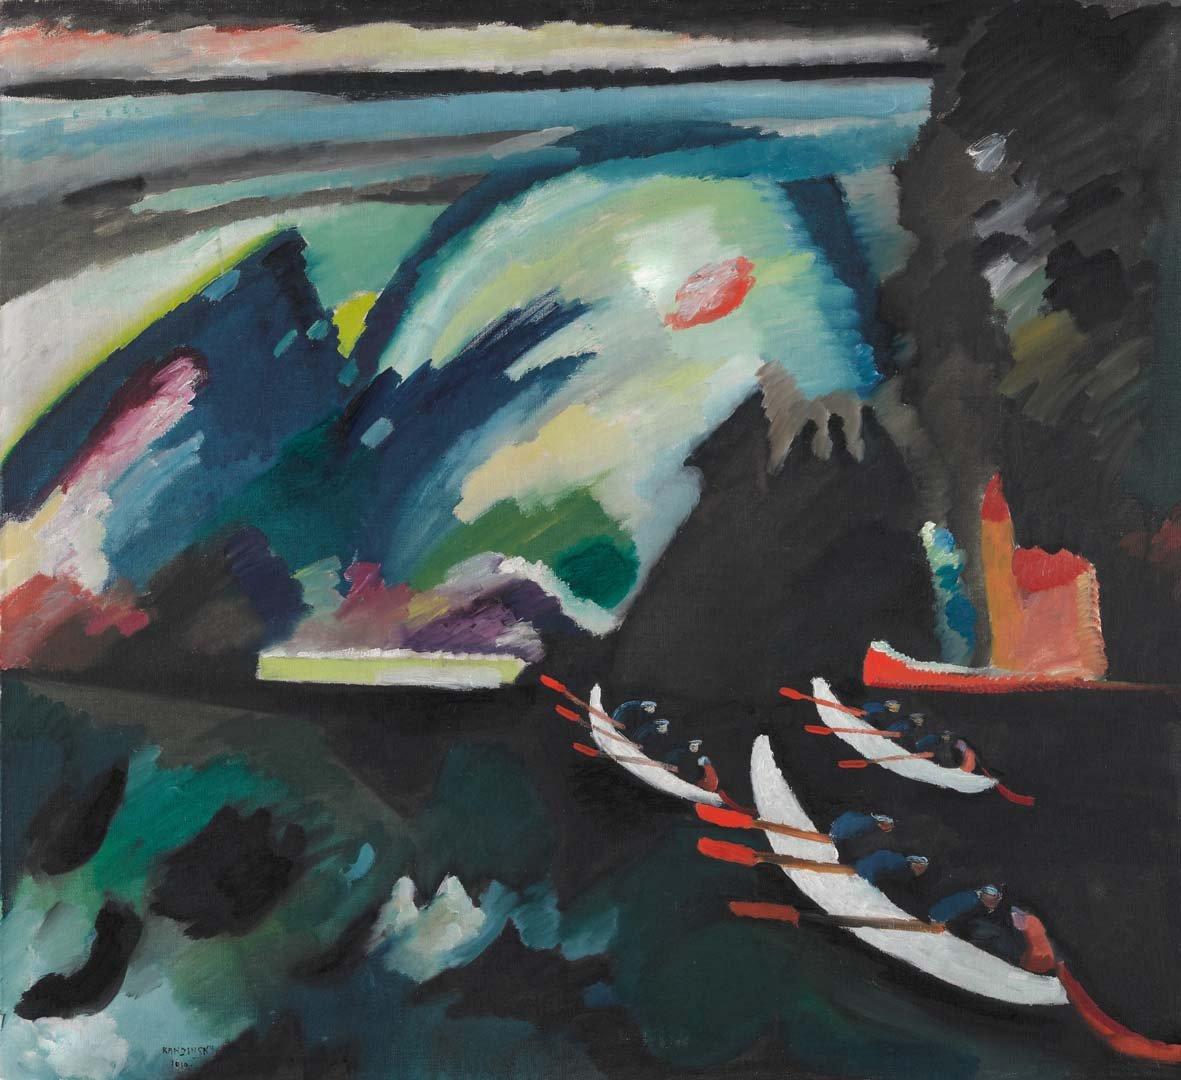 Vasilij Kandinskij Lago. 1910. Olio su tela. 98 x 105. Mosca, Galleria Tret'jakovskaja